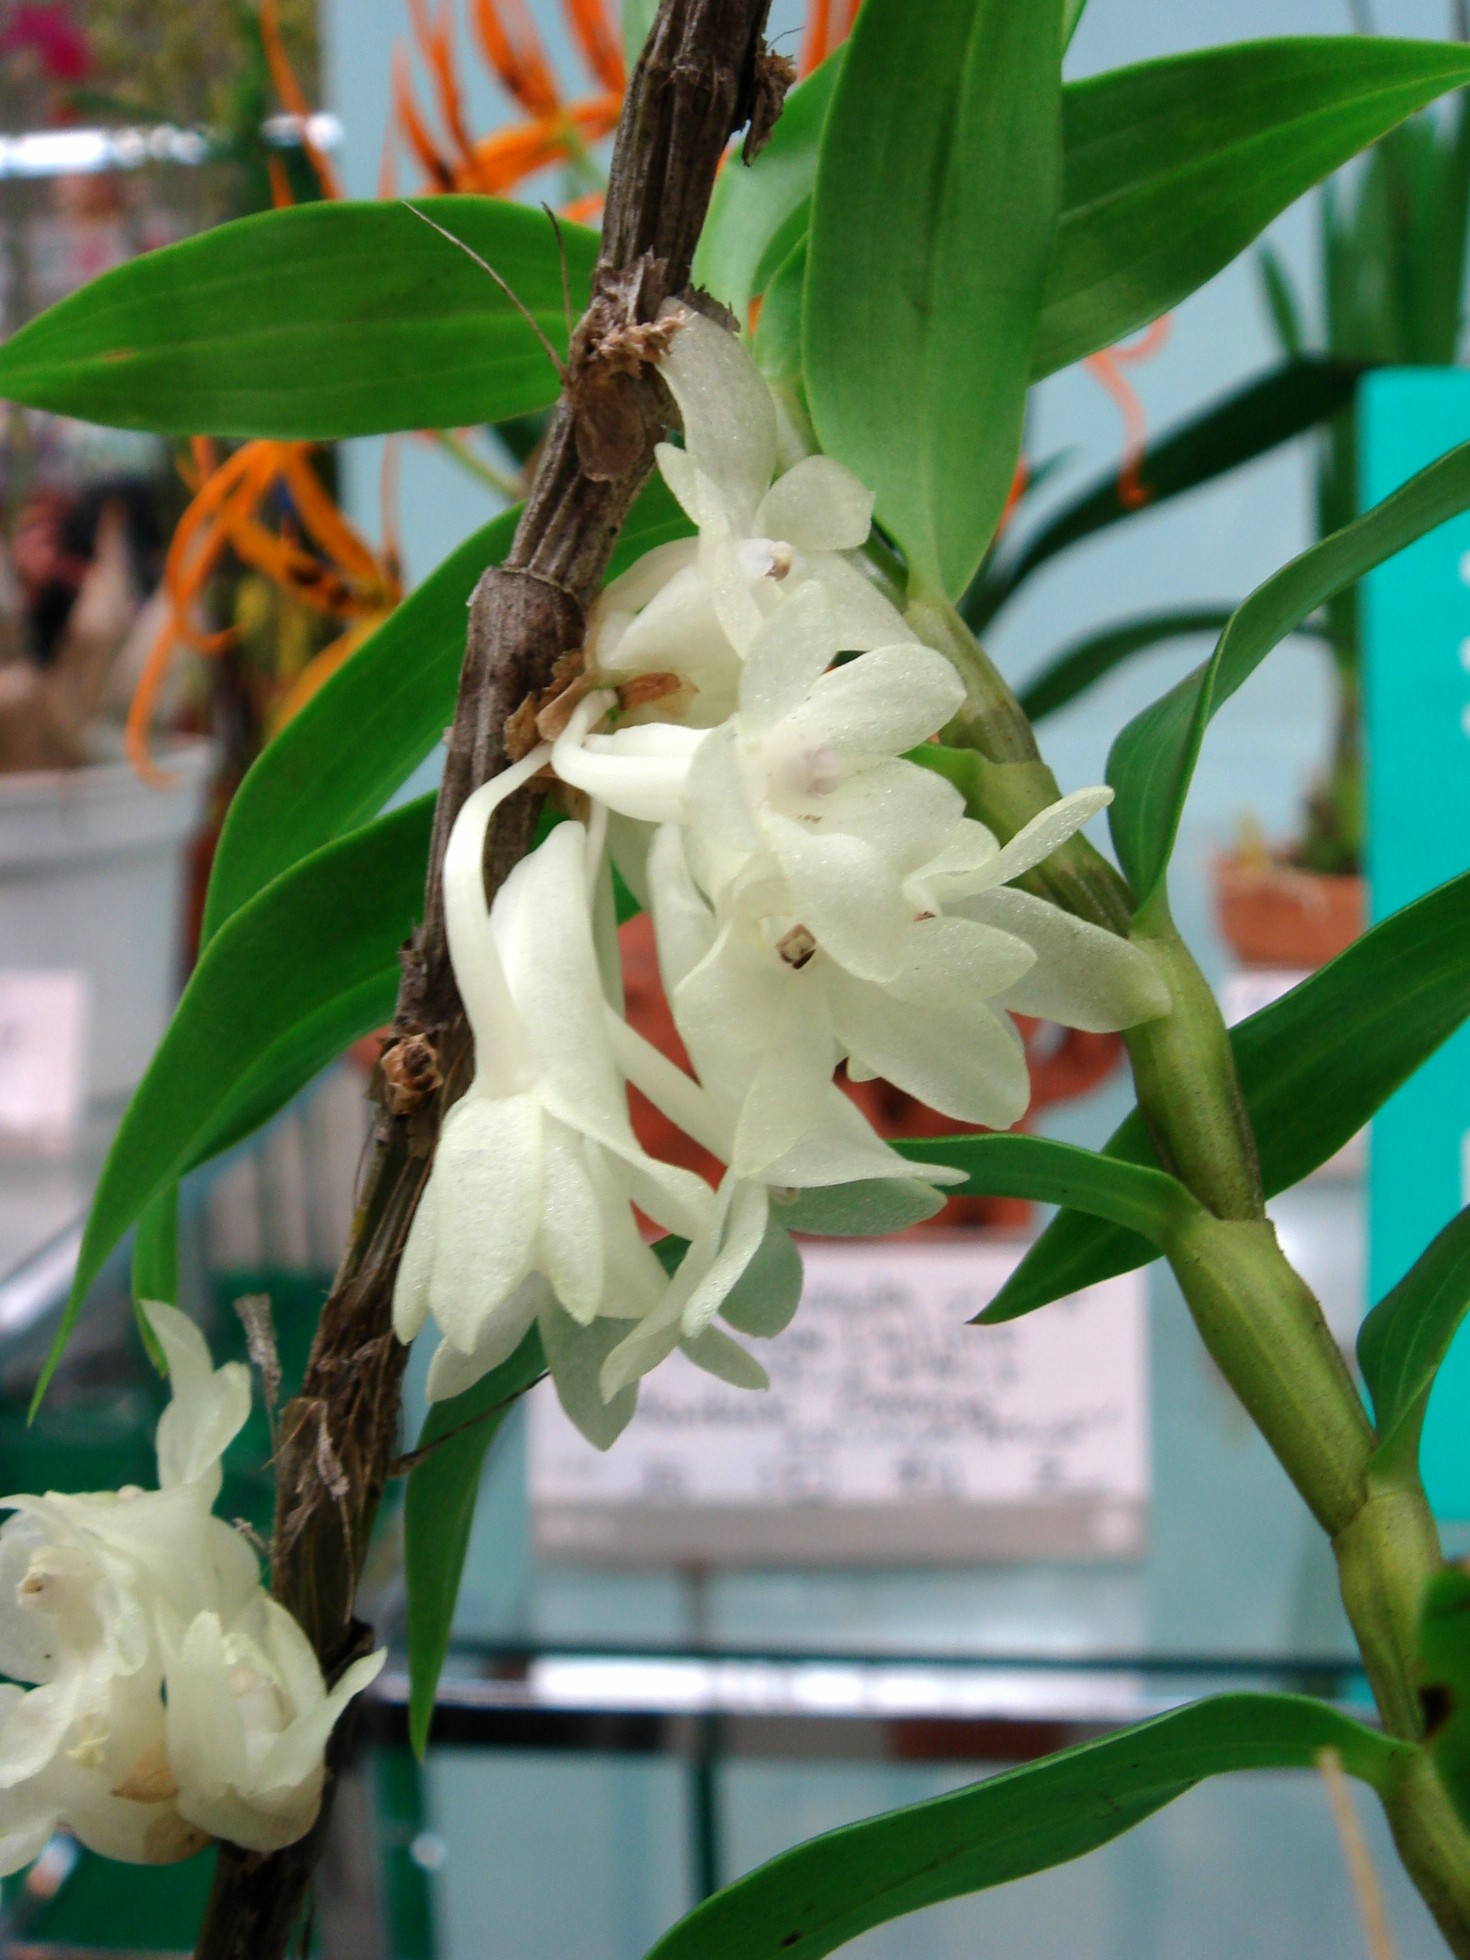 http://orchids.la.coocan.jp/Dendrobium/Dendrobium%20aphanochilum/DSC07580.JPG